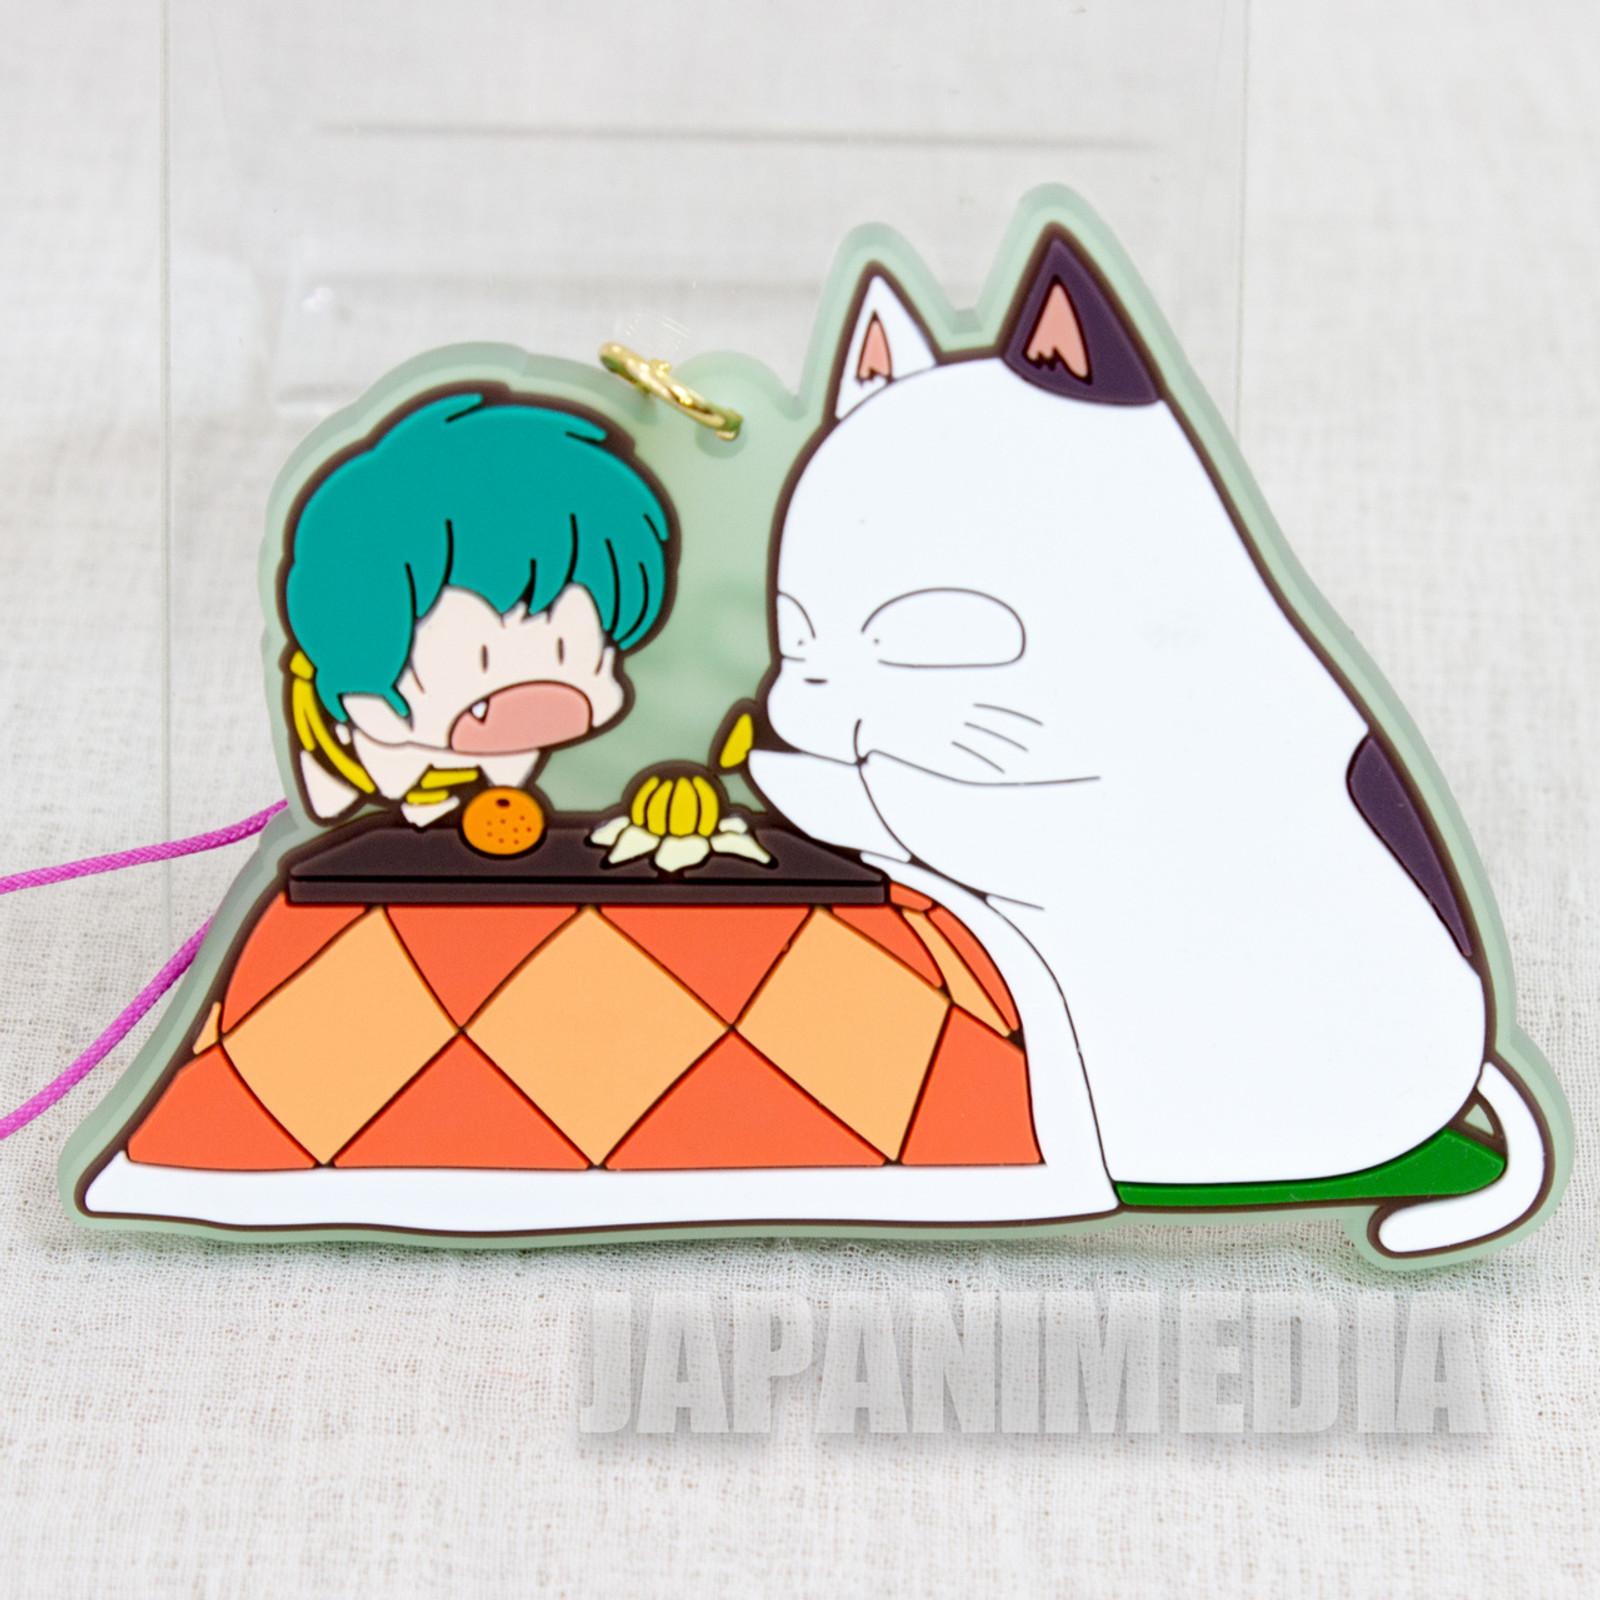 Urusei Yatsura Kotatsuneko & TEN Mascot Rubber Strap JAPAN ANIME MANGA